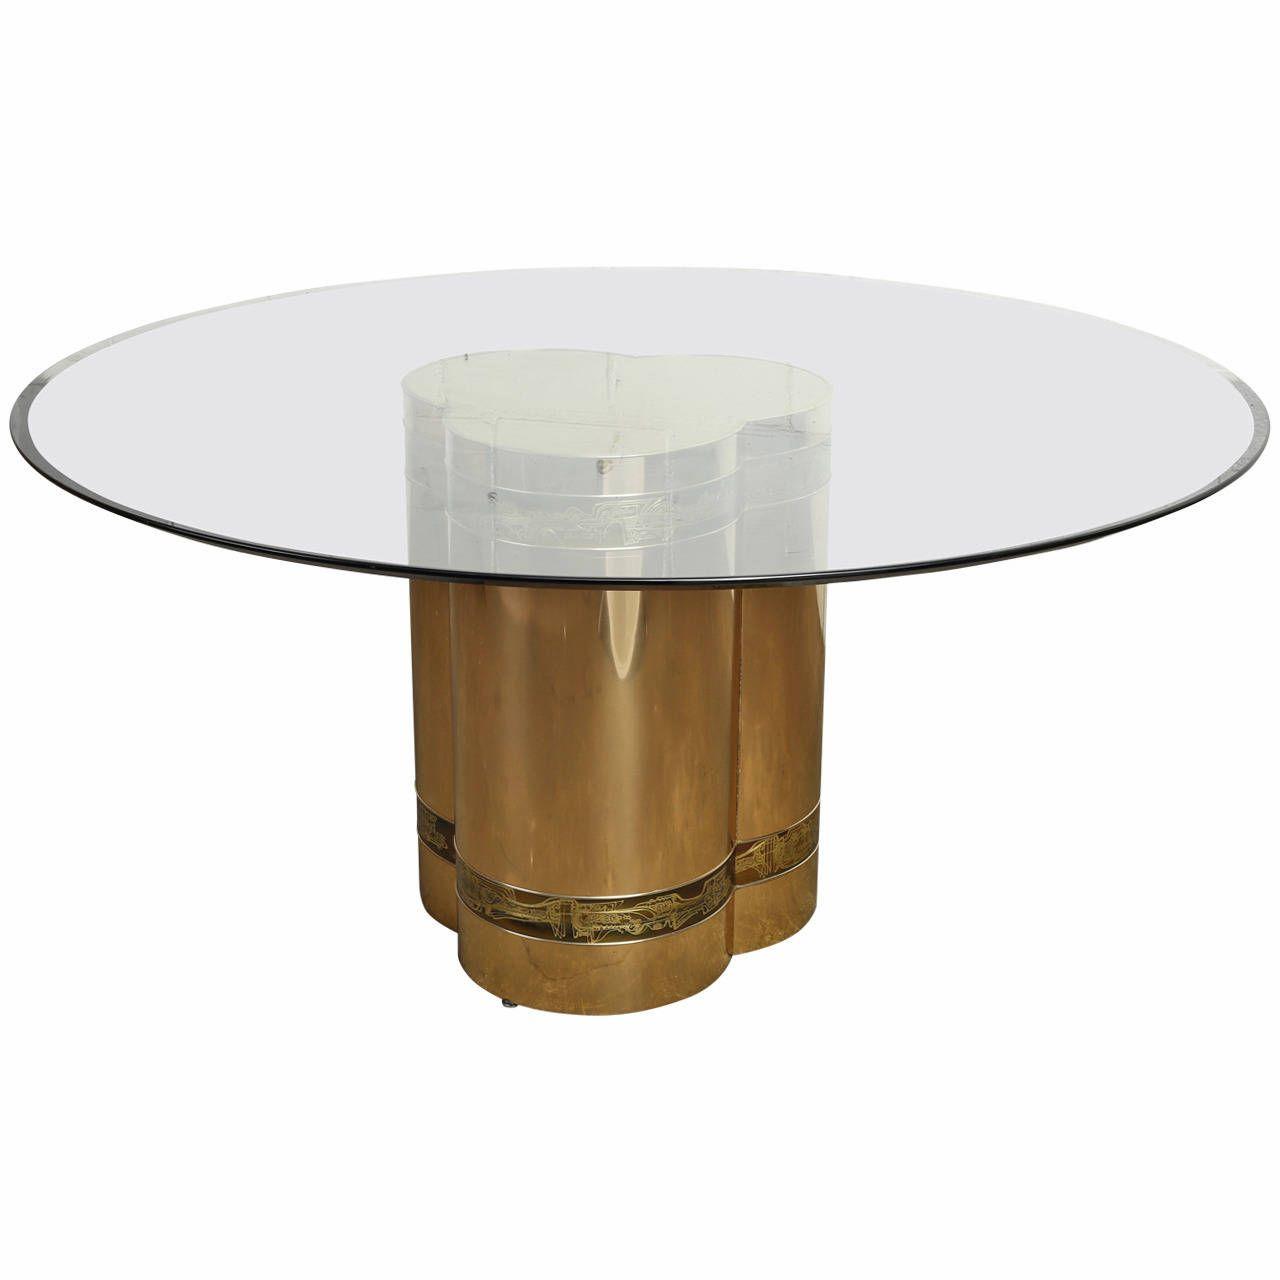 Mastercraft brass dining table - Radiant Acid Etched Brass Dining Table By Bernhard Rohne For Mastercraft